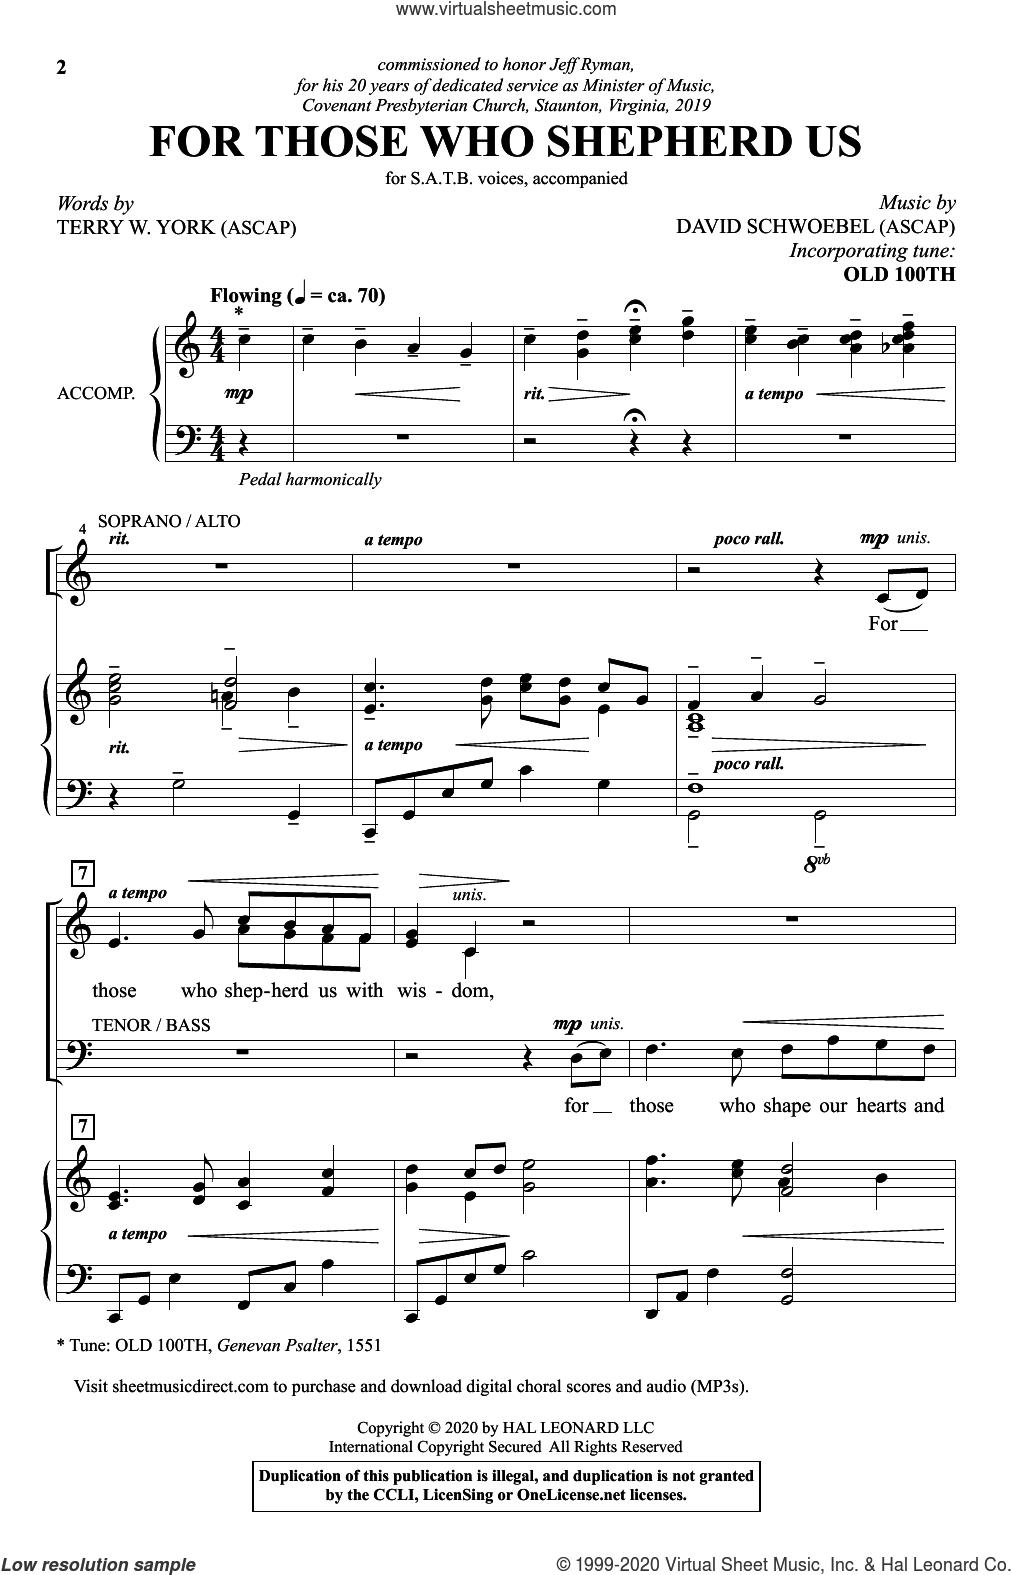 For Those Who Shepherd Us sheet music for choir (SATB: soprano, alto, tenor, bass) by David Schwoebel, Terry W. York and Terry W. York and David Schwoebel, intermediate skill level